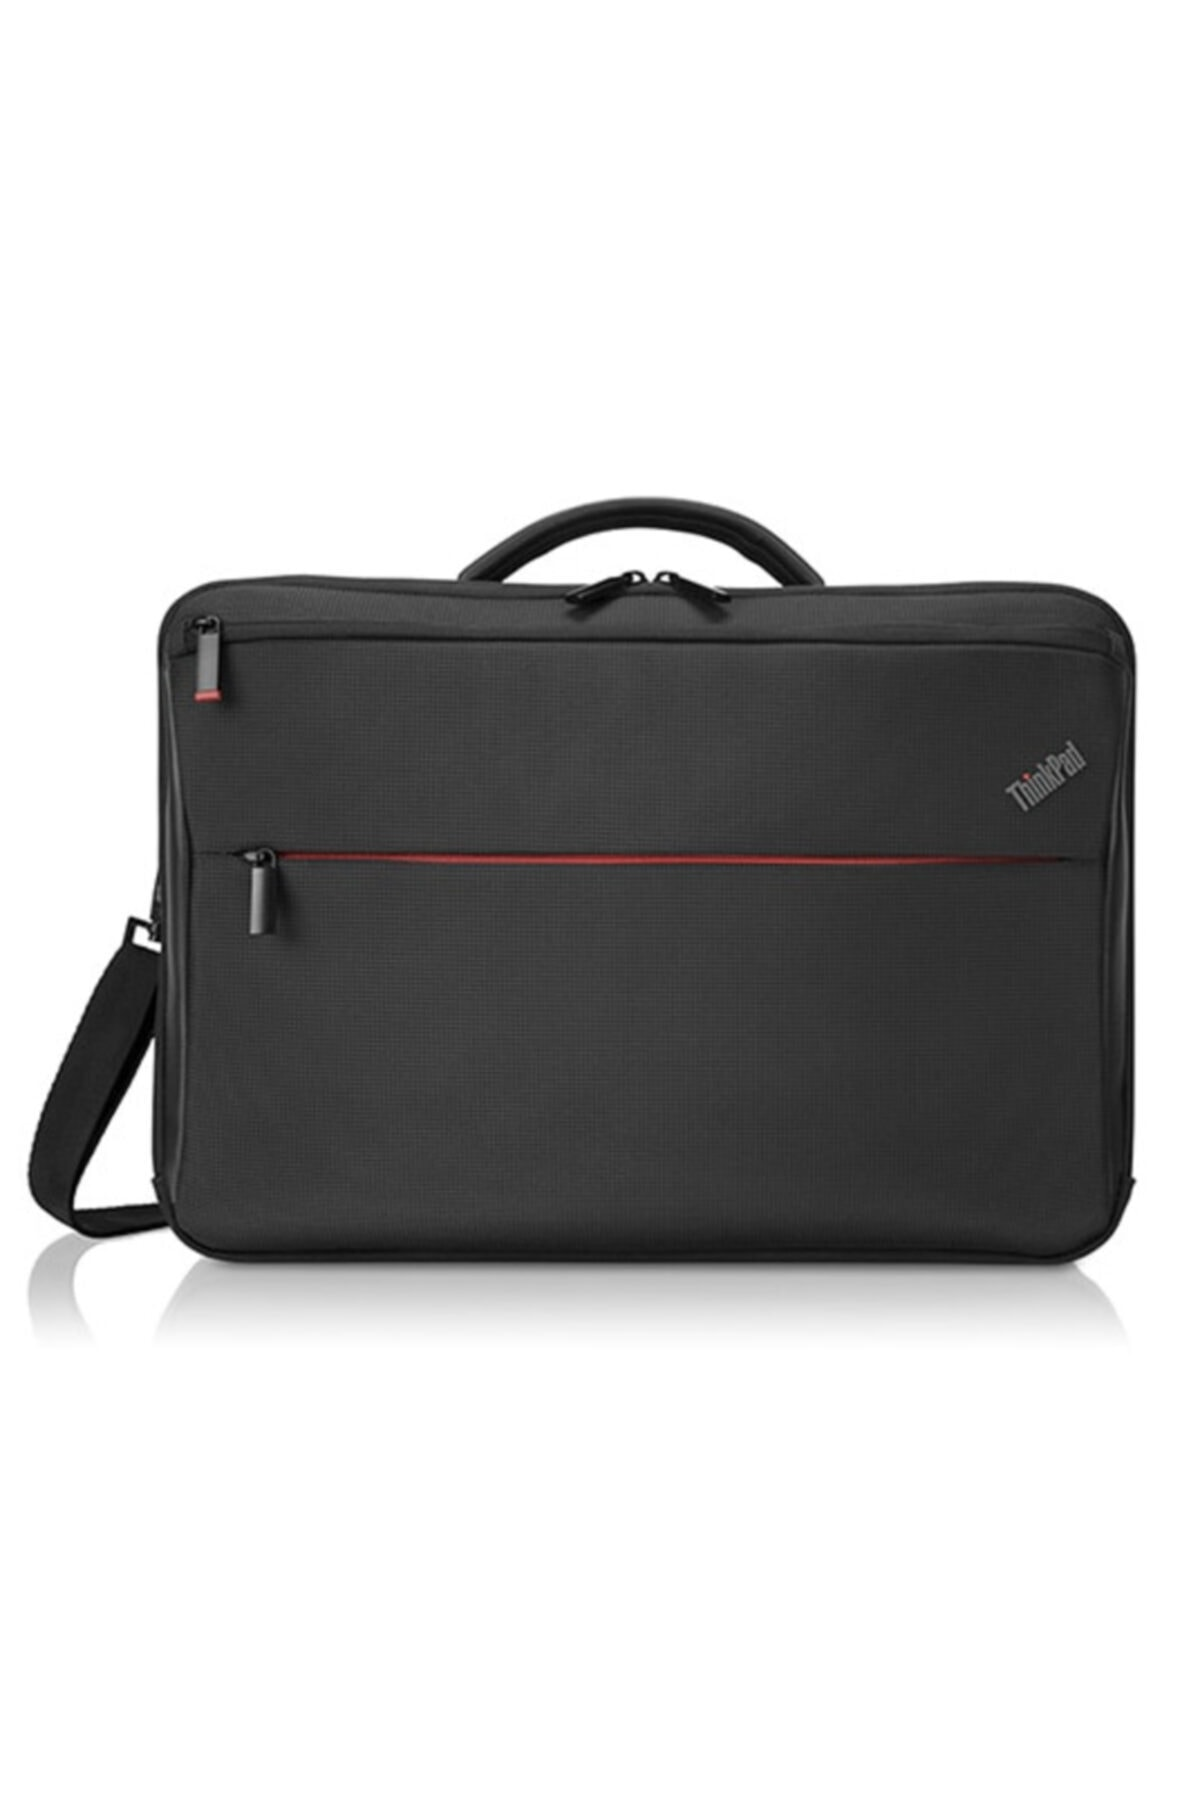 "LENOVO 4x40q26384 Thinkpad Professional Topload 15.6"" Notebook Çantası 1"